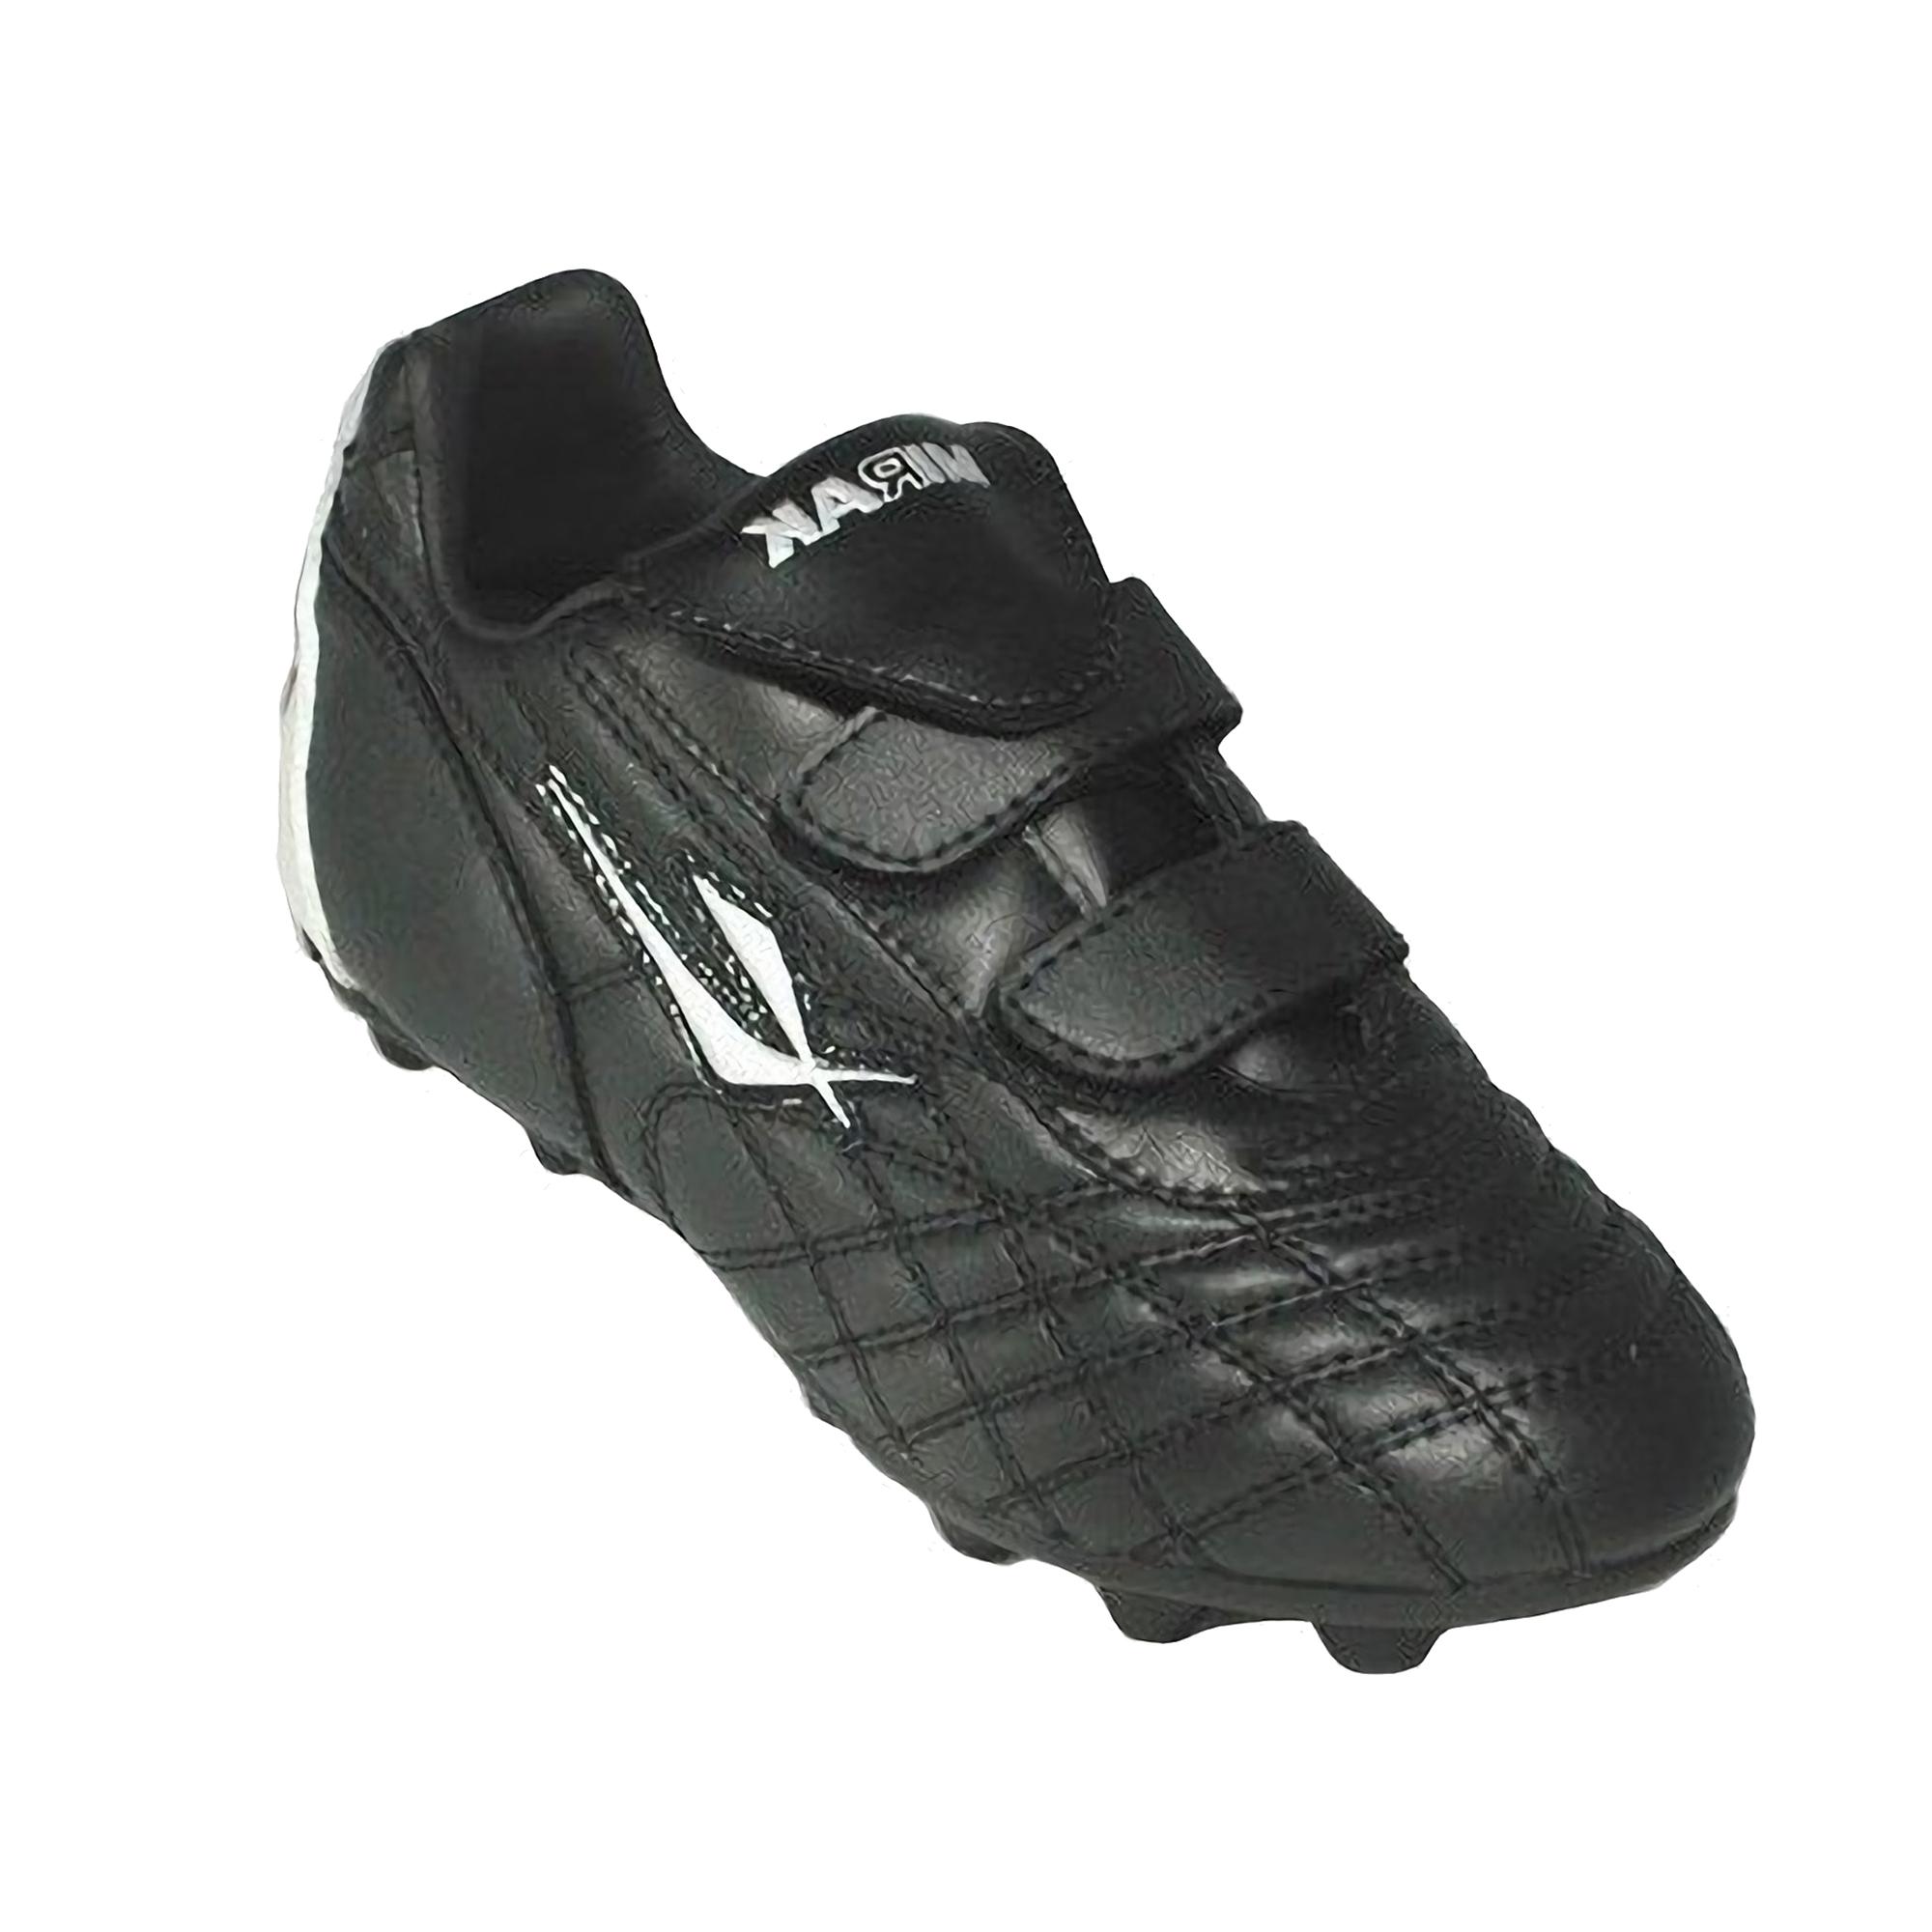 Mirak Forward Childrens/Kids Boys Football/Rugby Screw-In Boots (3 UK) (Black)